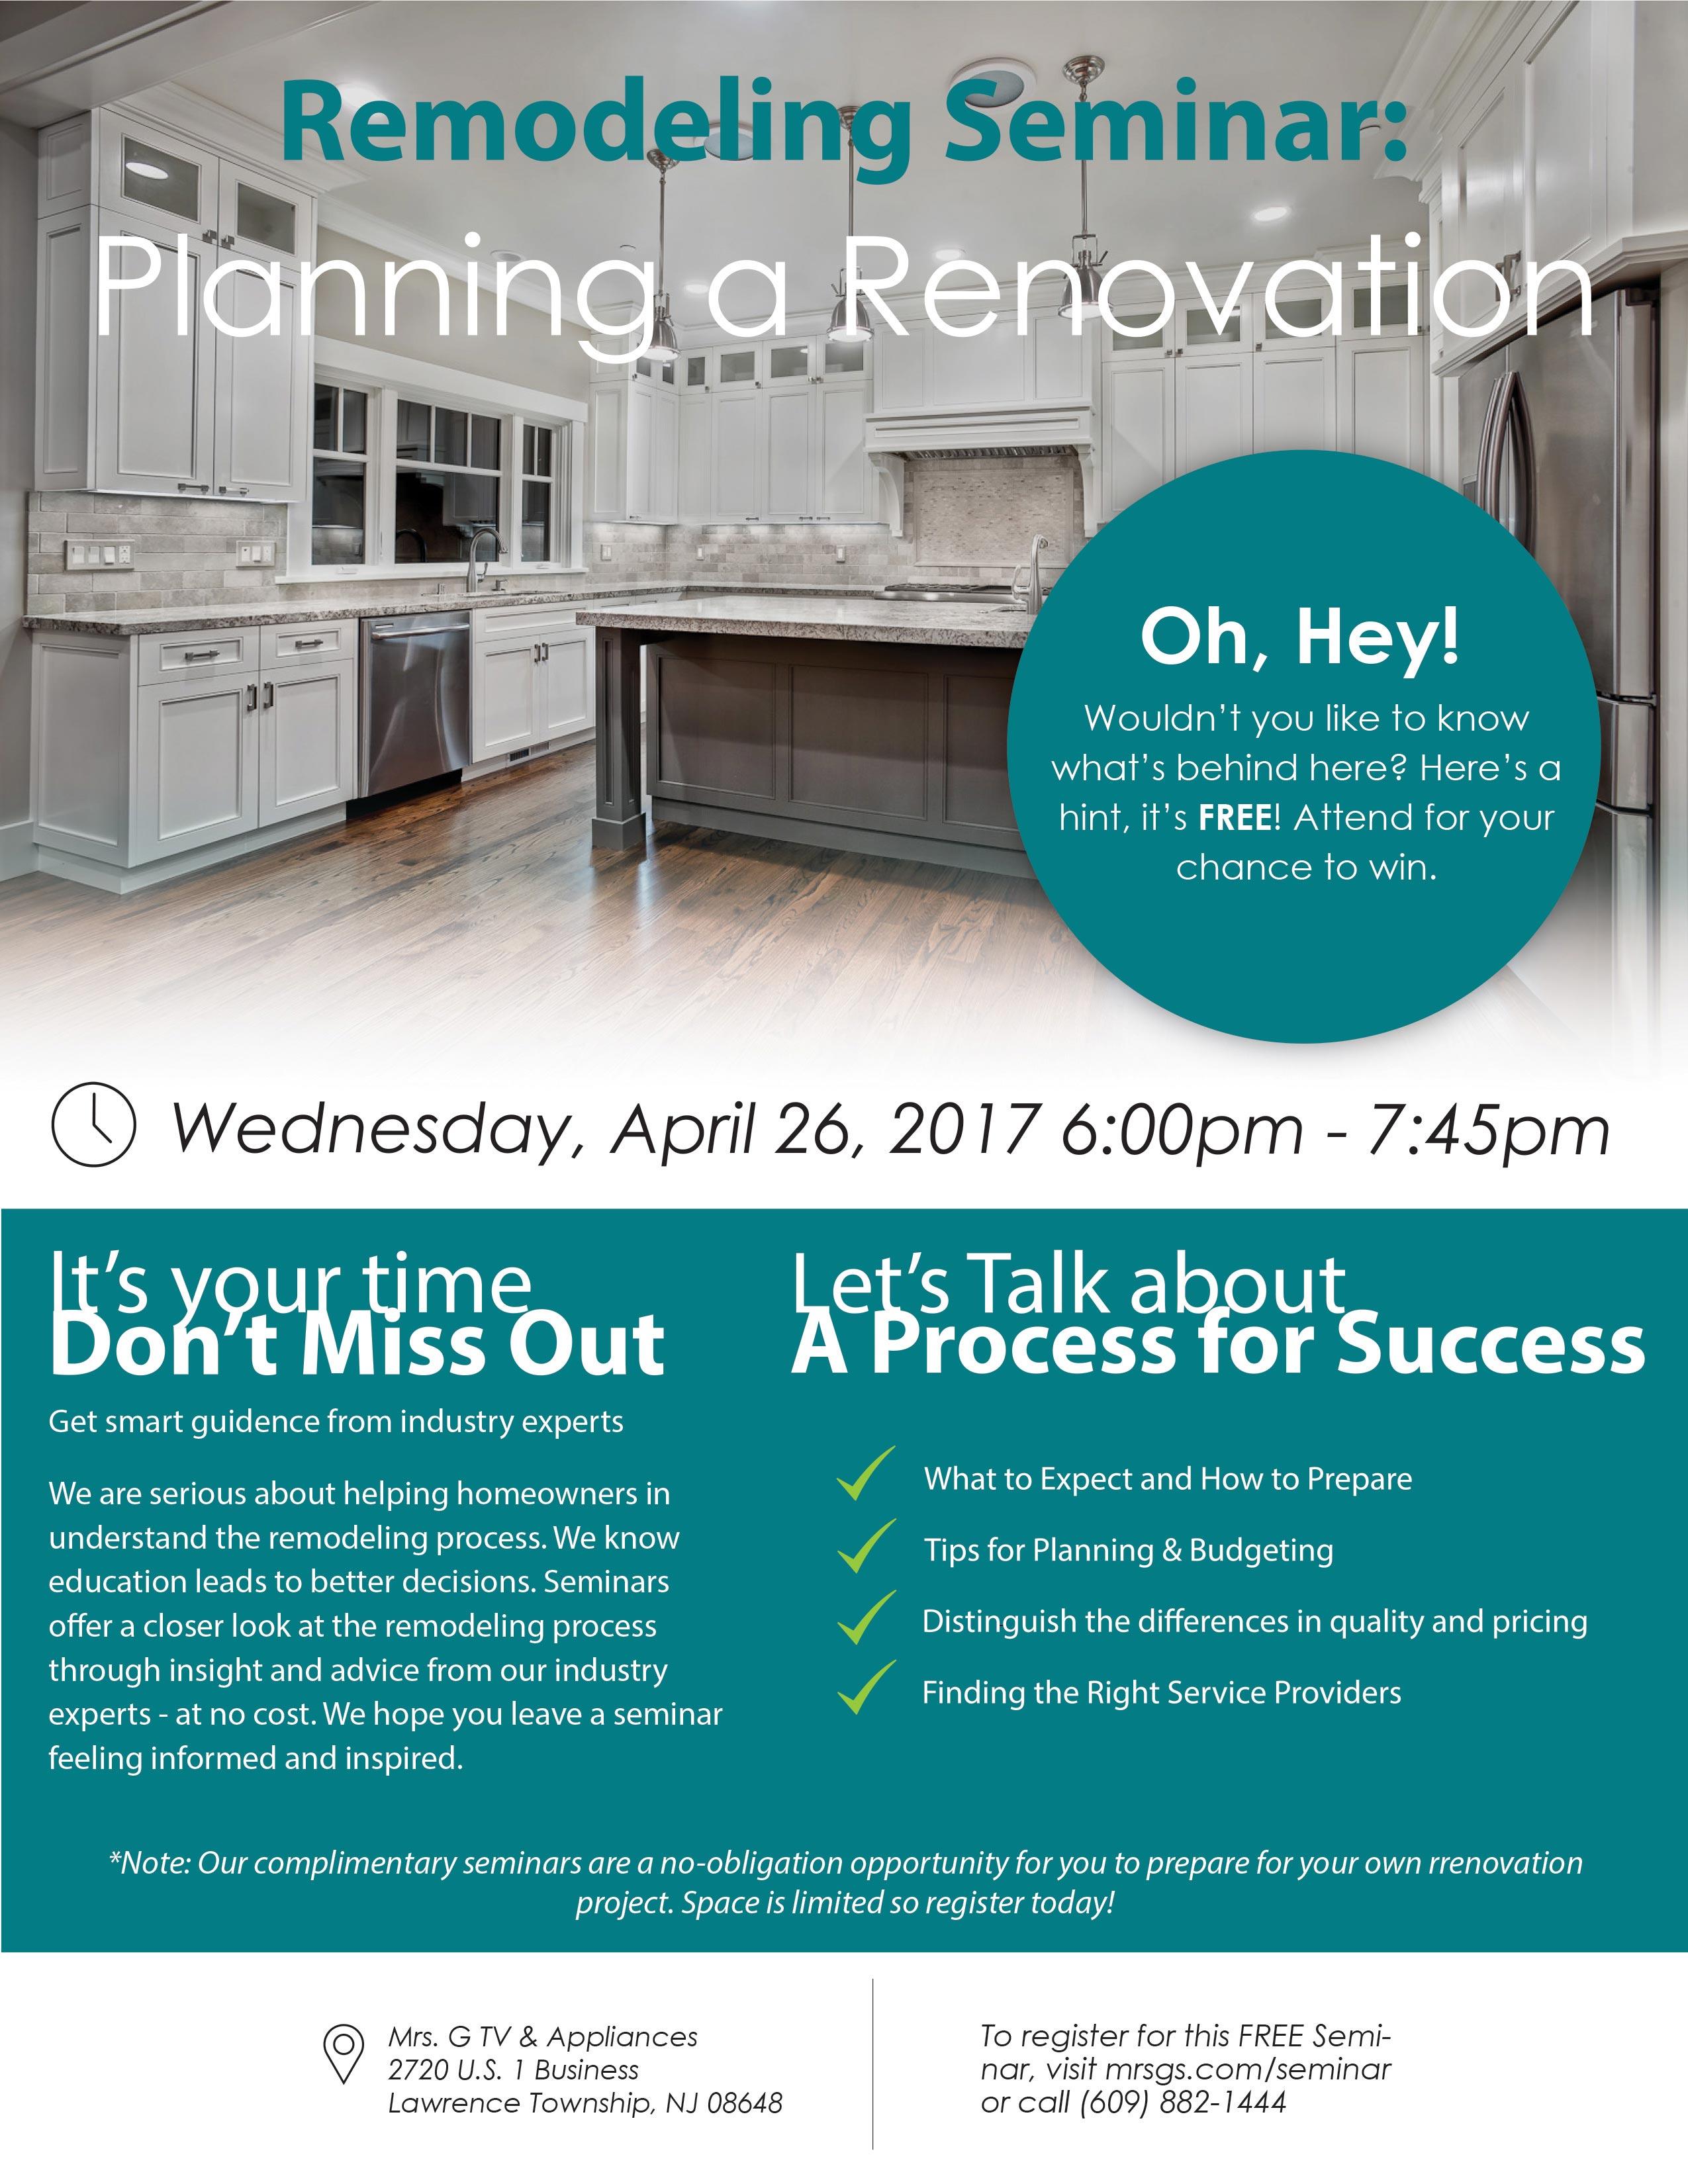 Landing Page Remodeling Seminar - DES Home Renovations